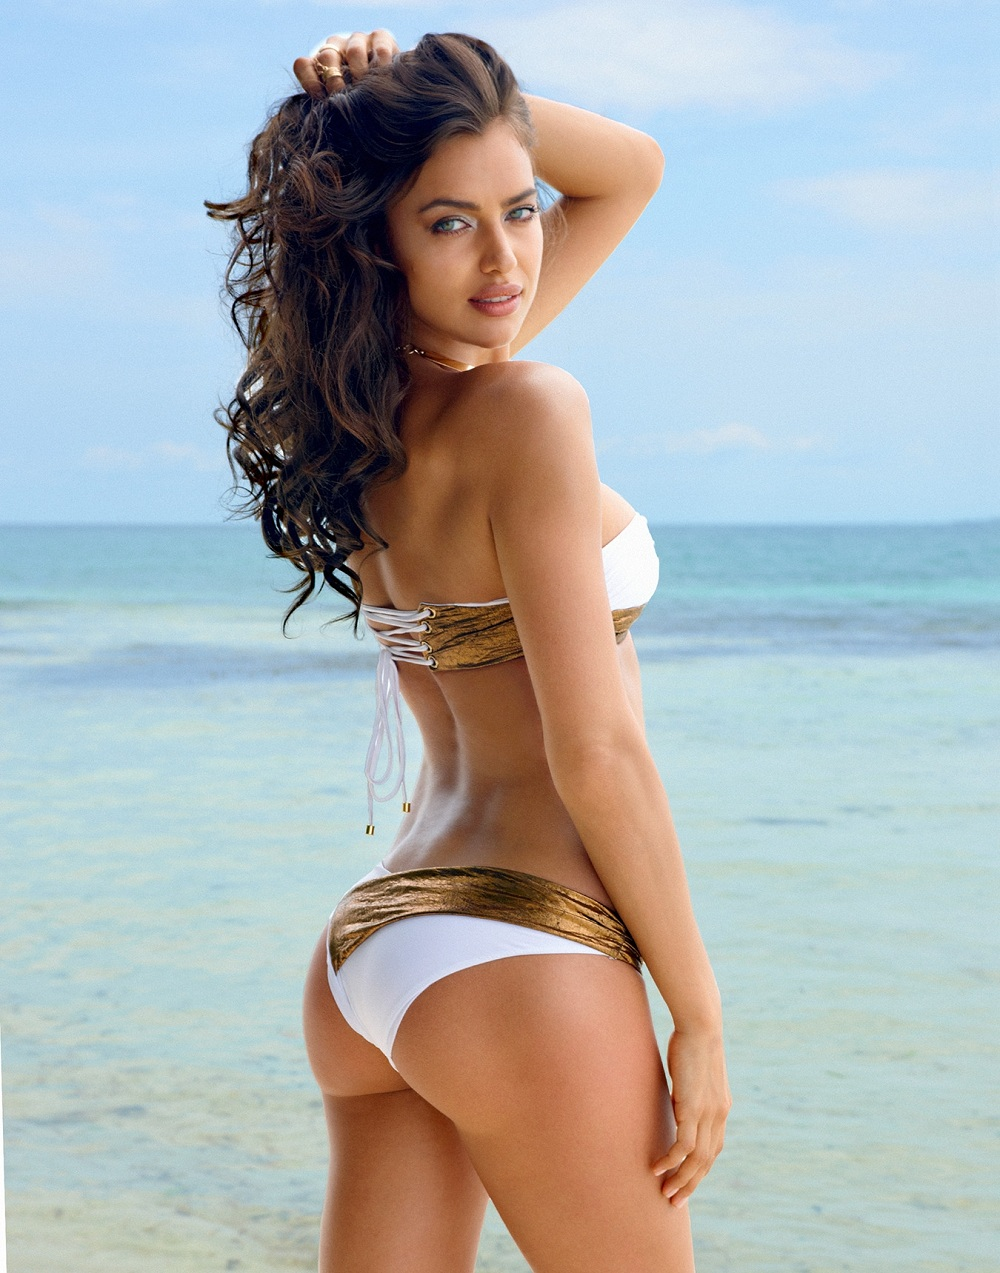 Hot Adrienn Levai nude photos 2019